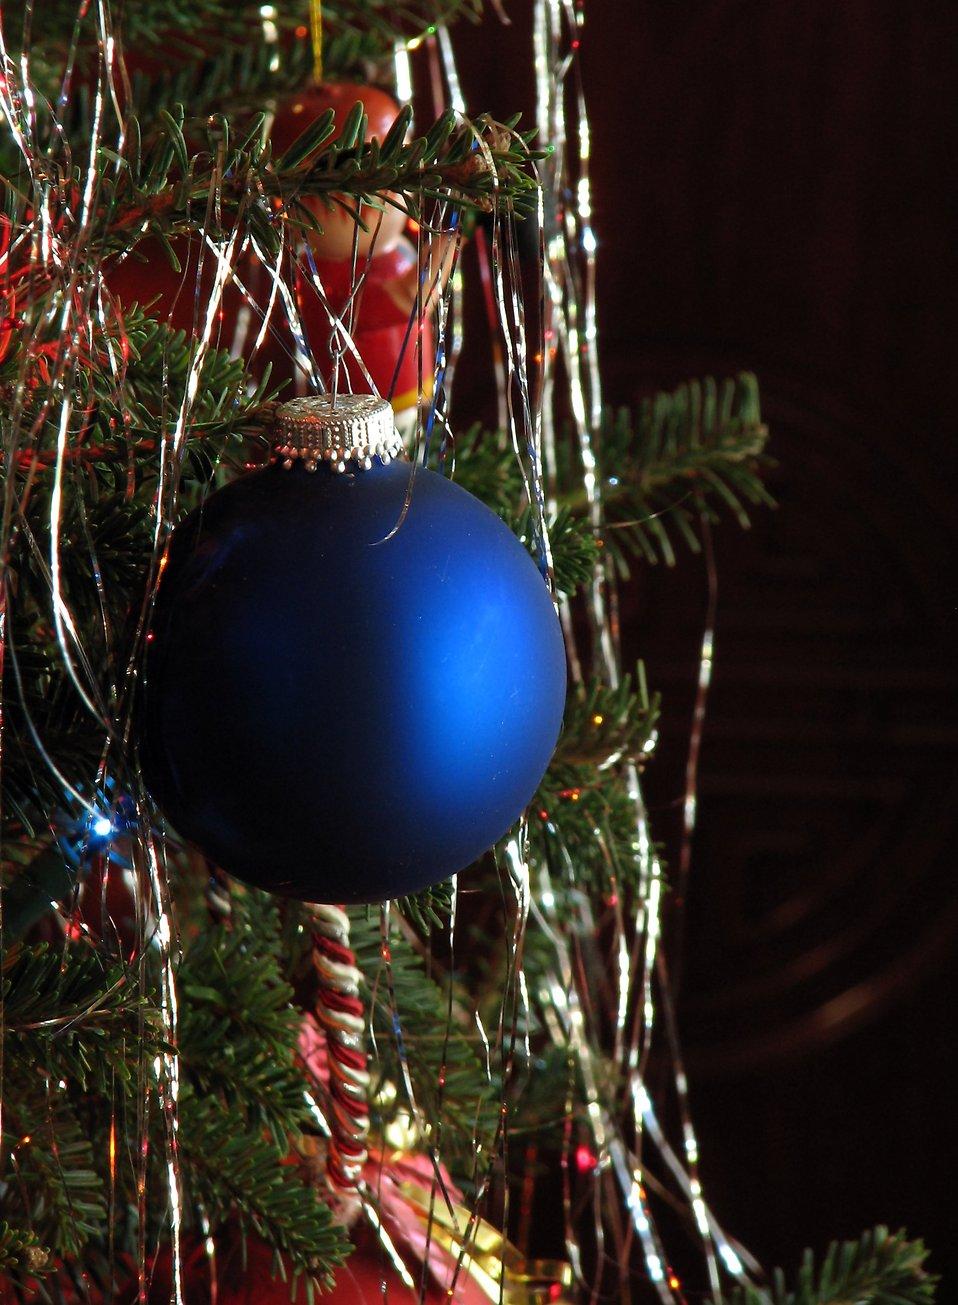 A blue Christmas ornament on a tree : Free Stock Photo